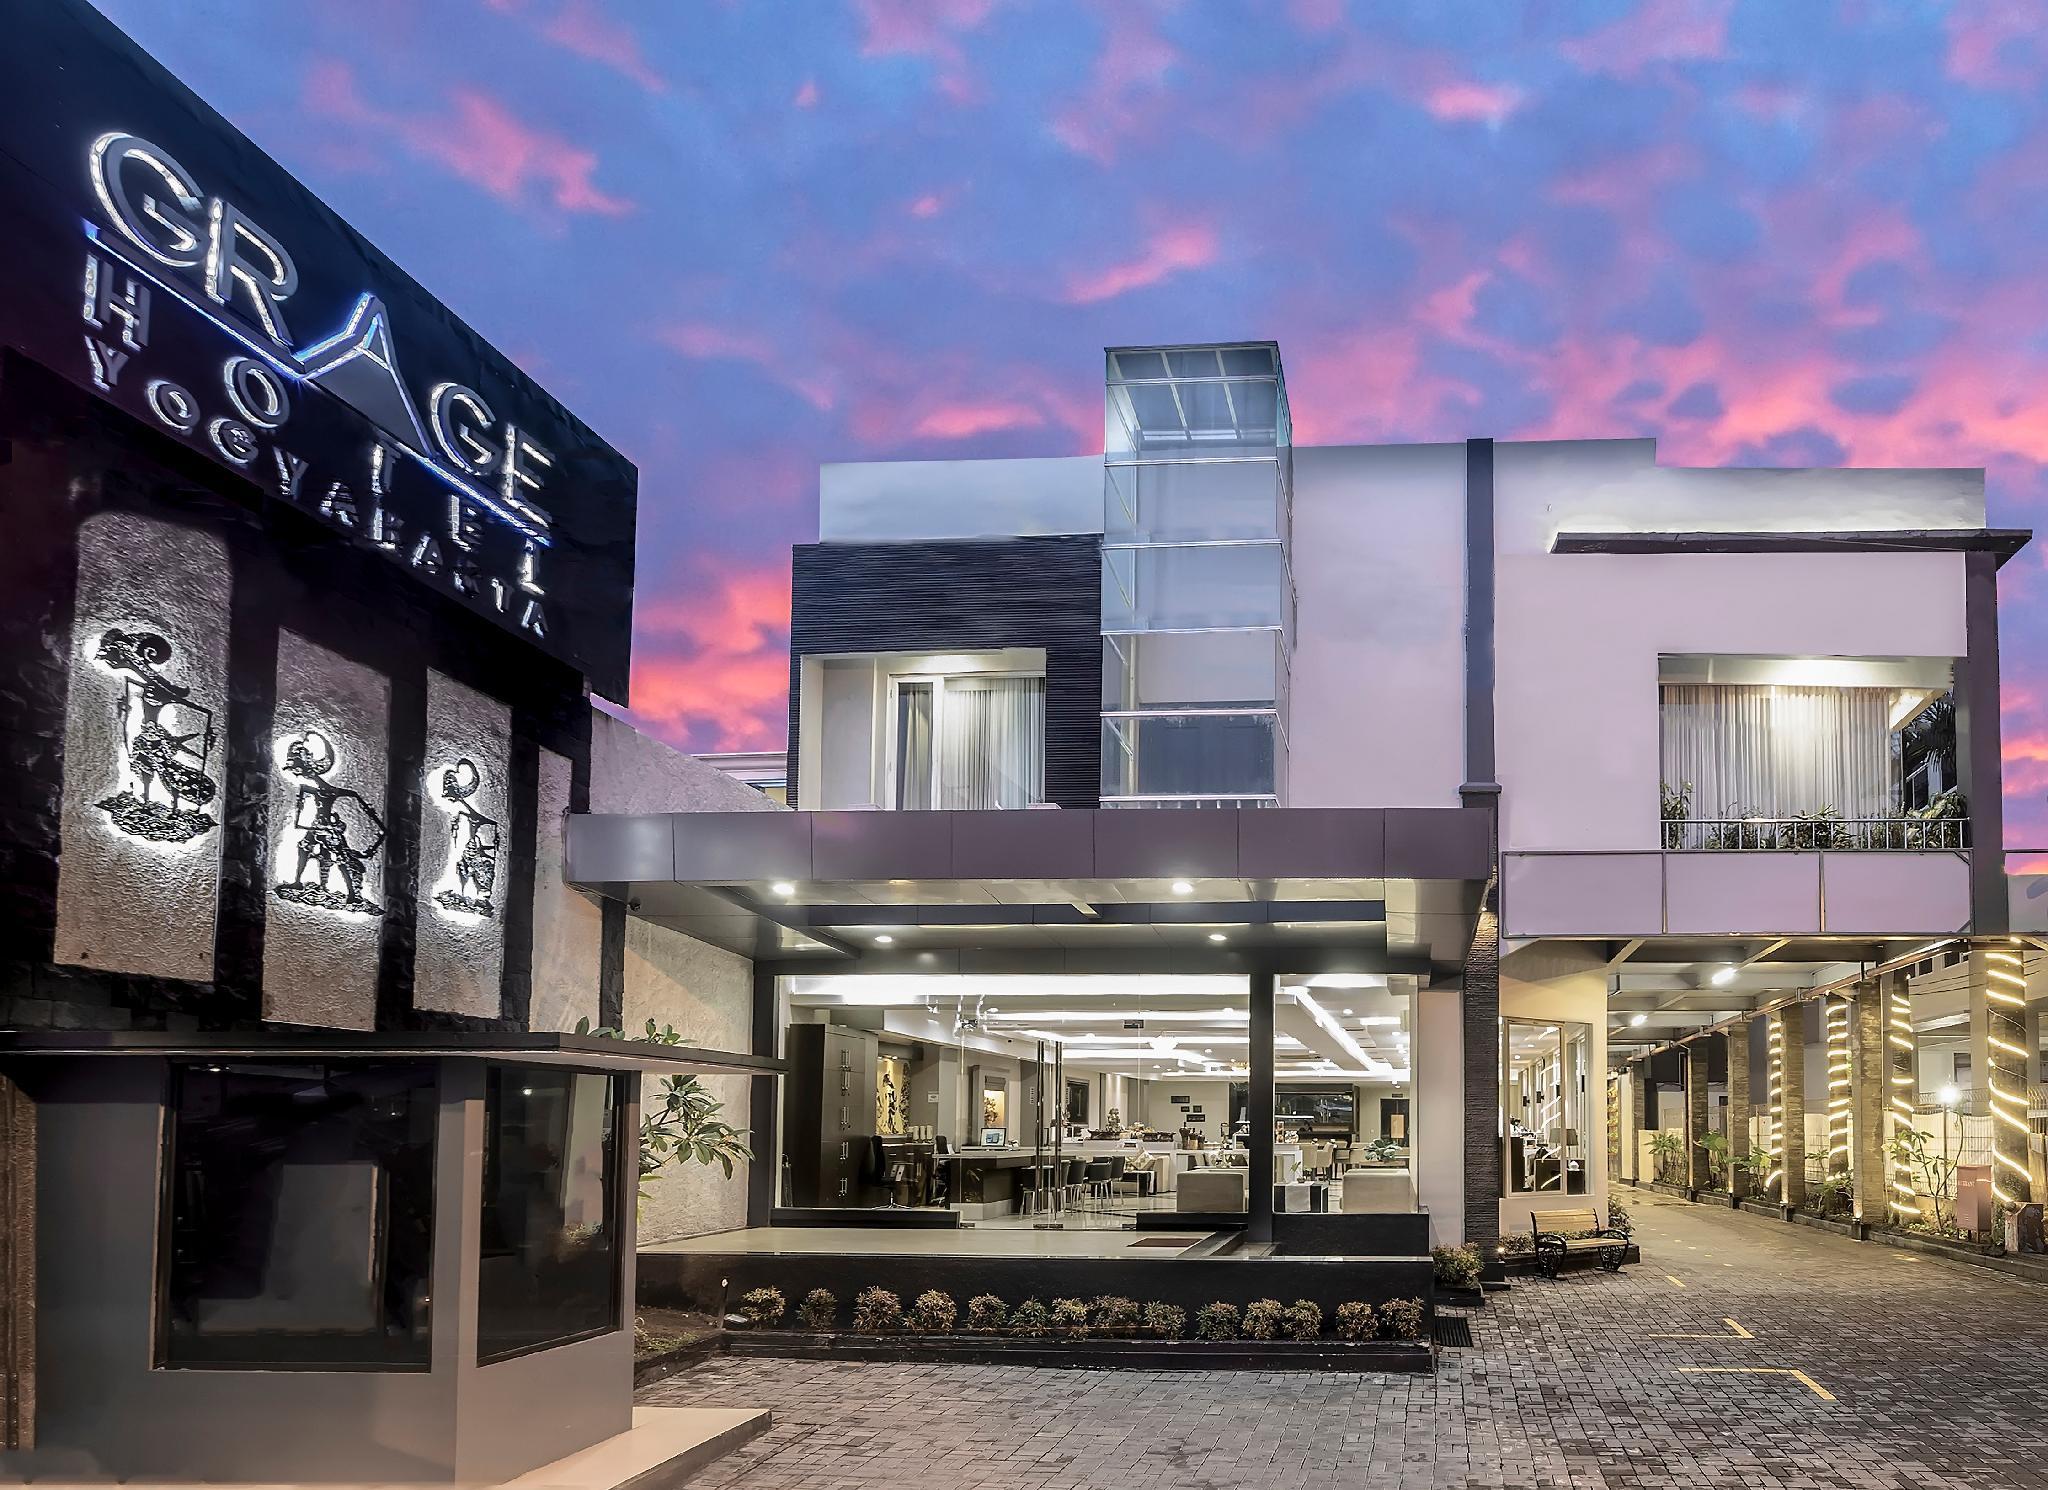 Grage Jogja Hotel